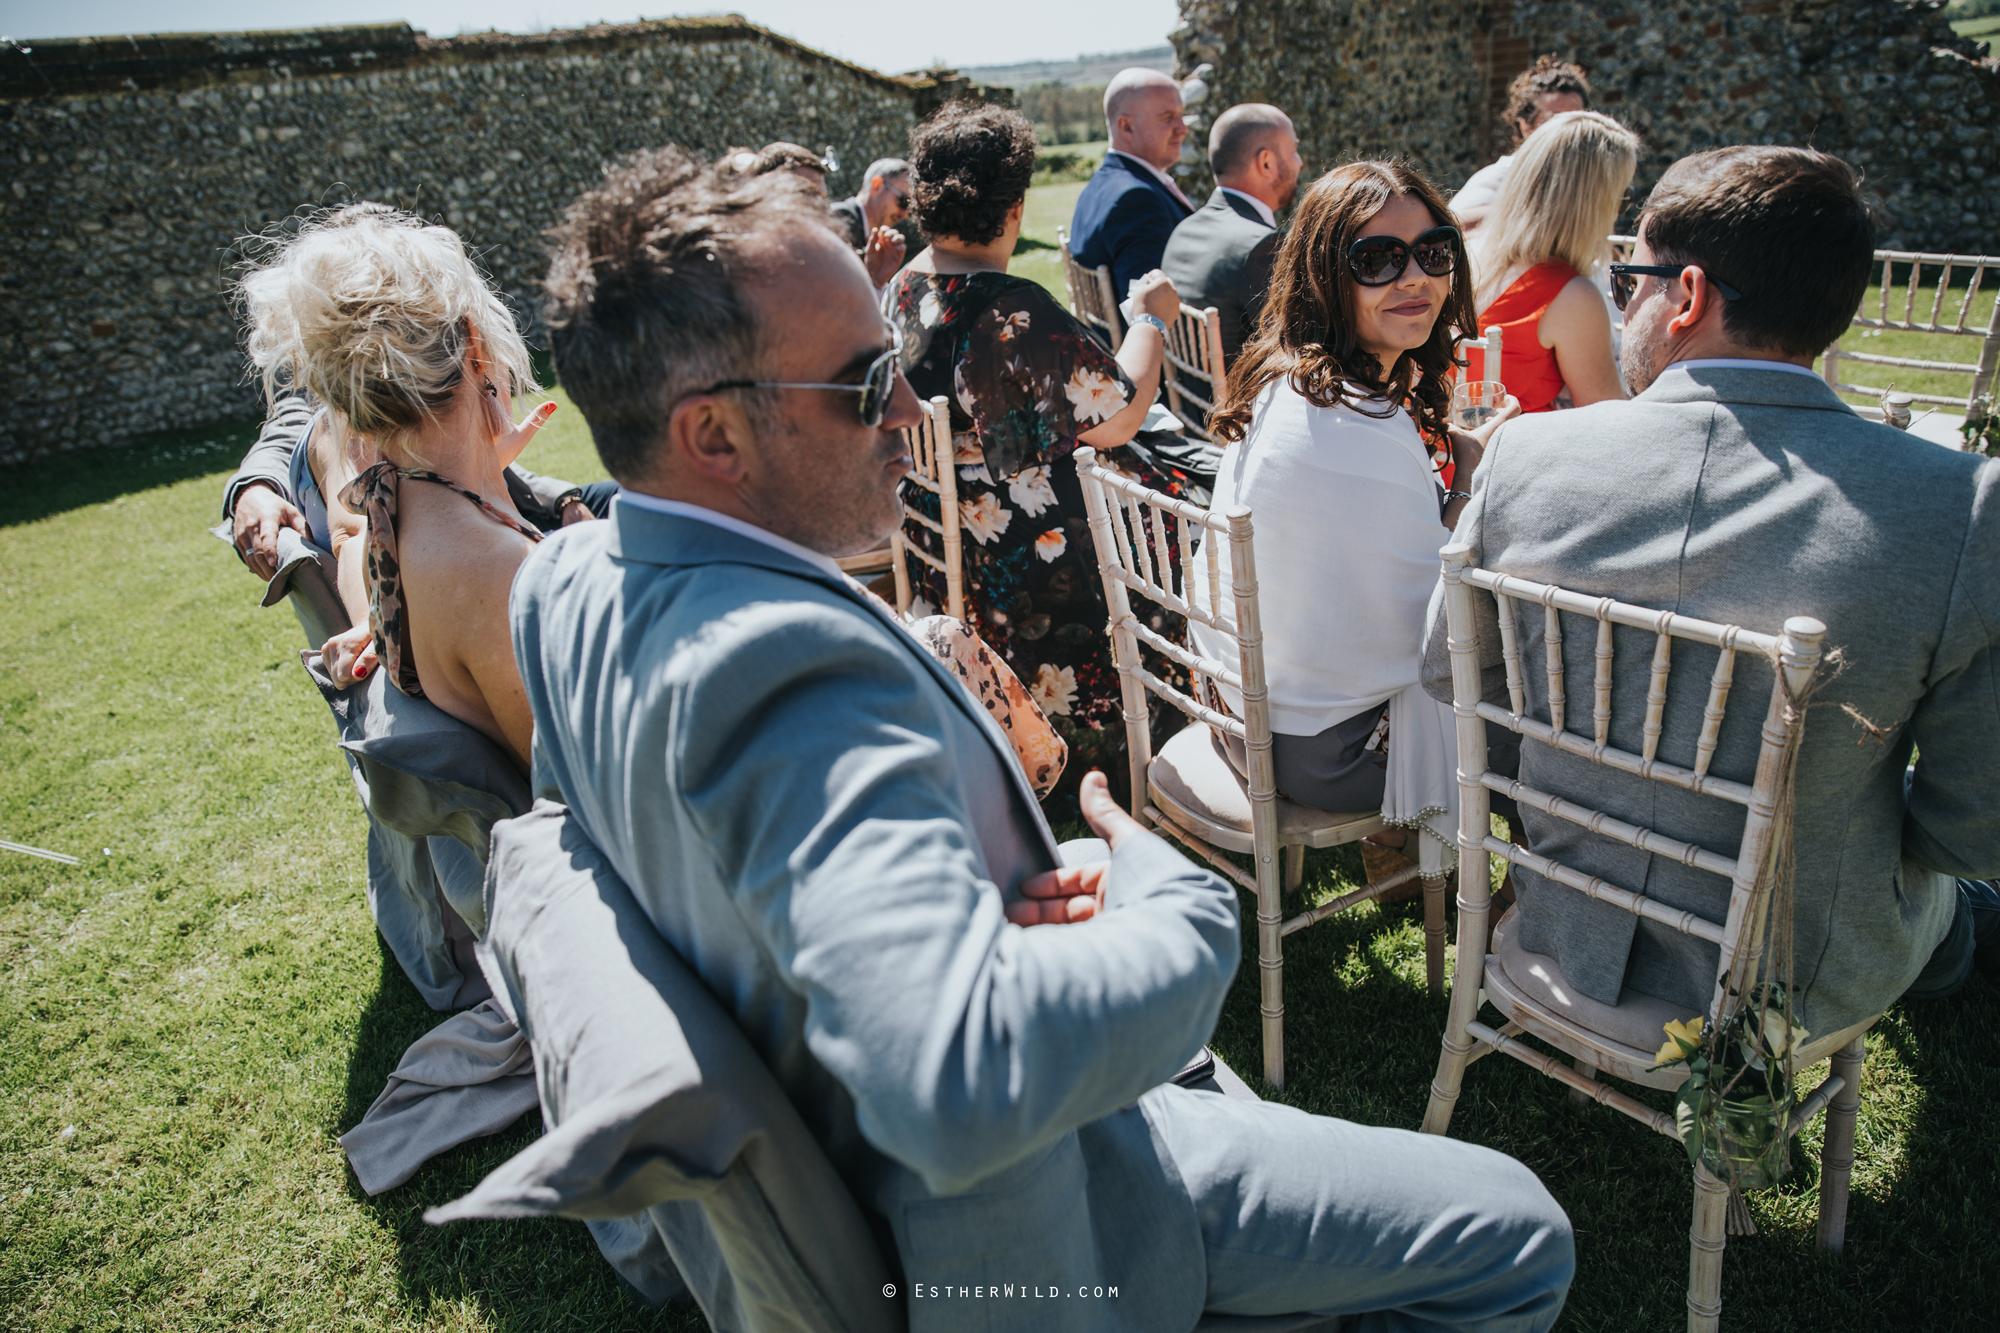 IMG_0599Cley_Barn_Drift_Norfolk_Coast_Wedding_Copyright_Esther_Wild_Photographer_.jpg